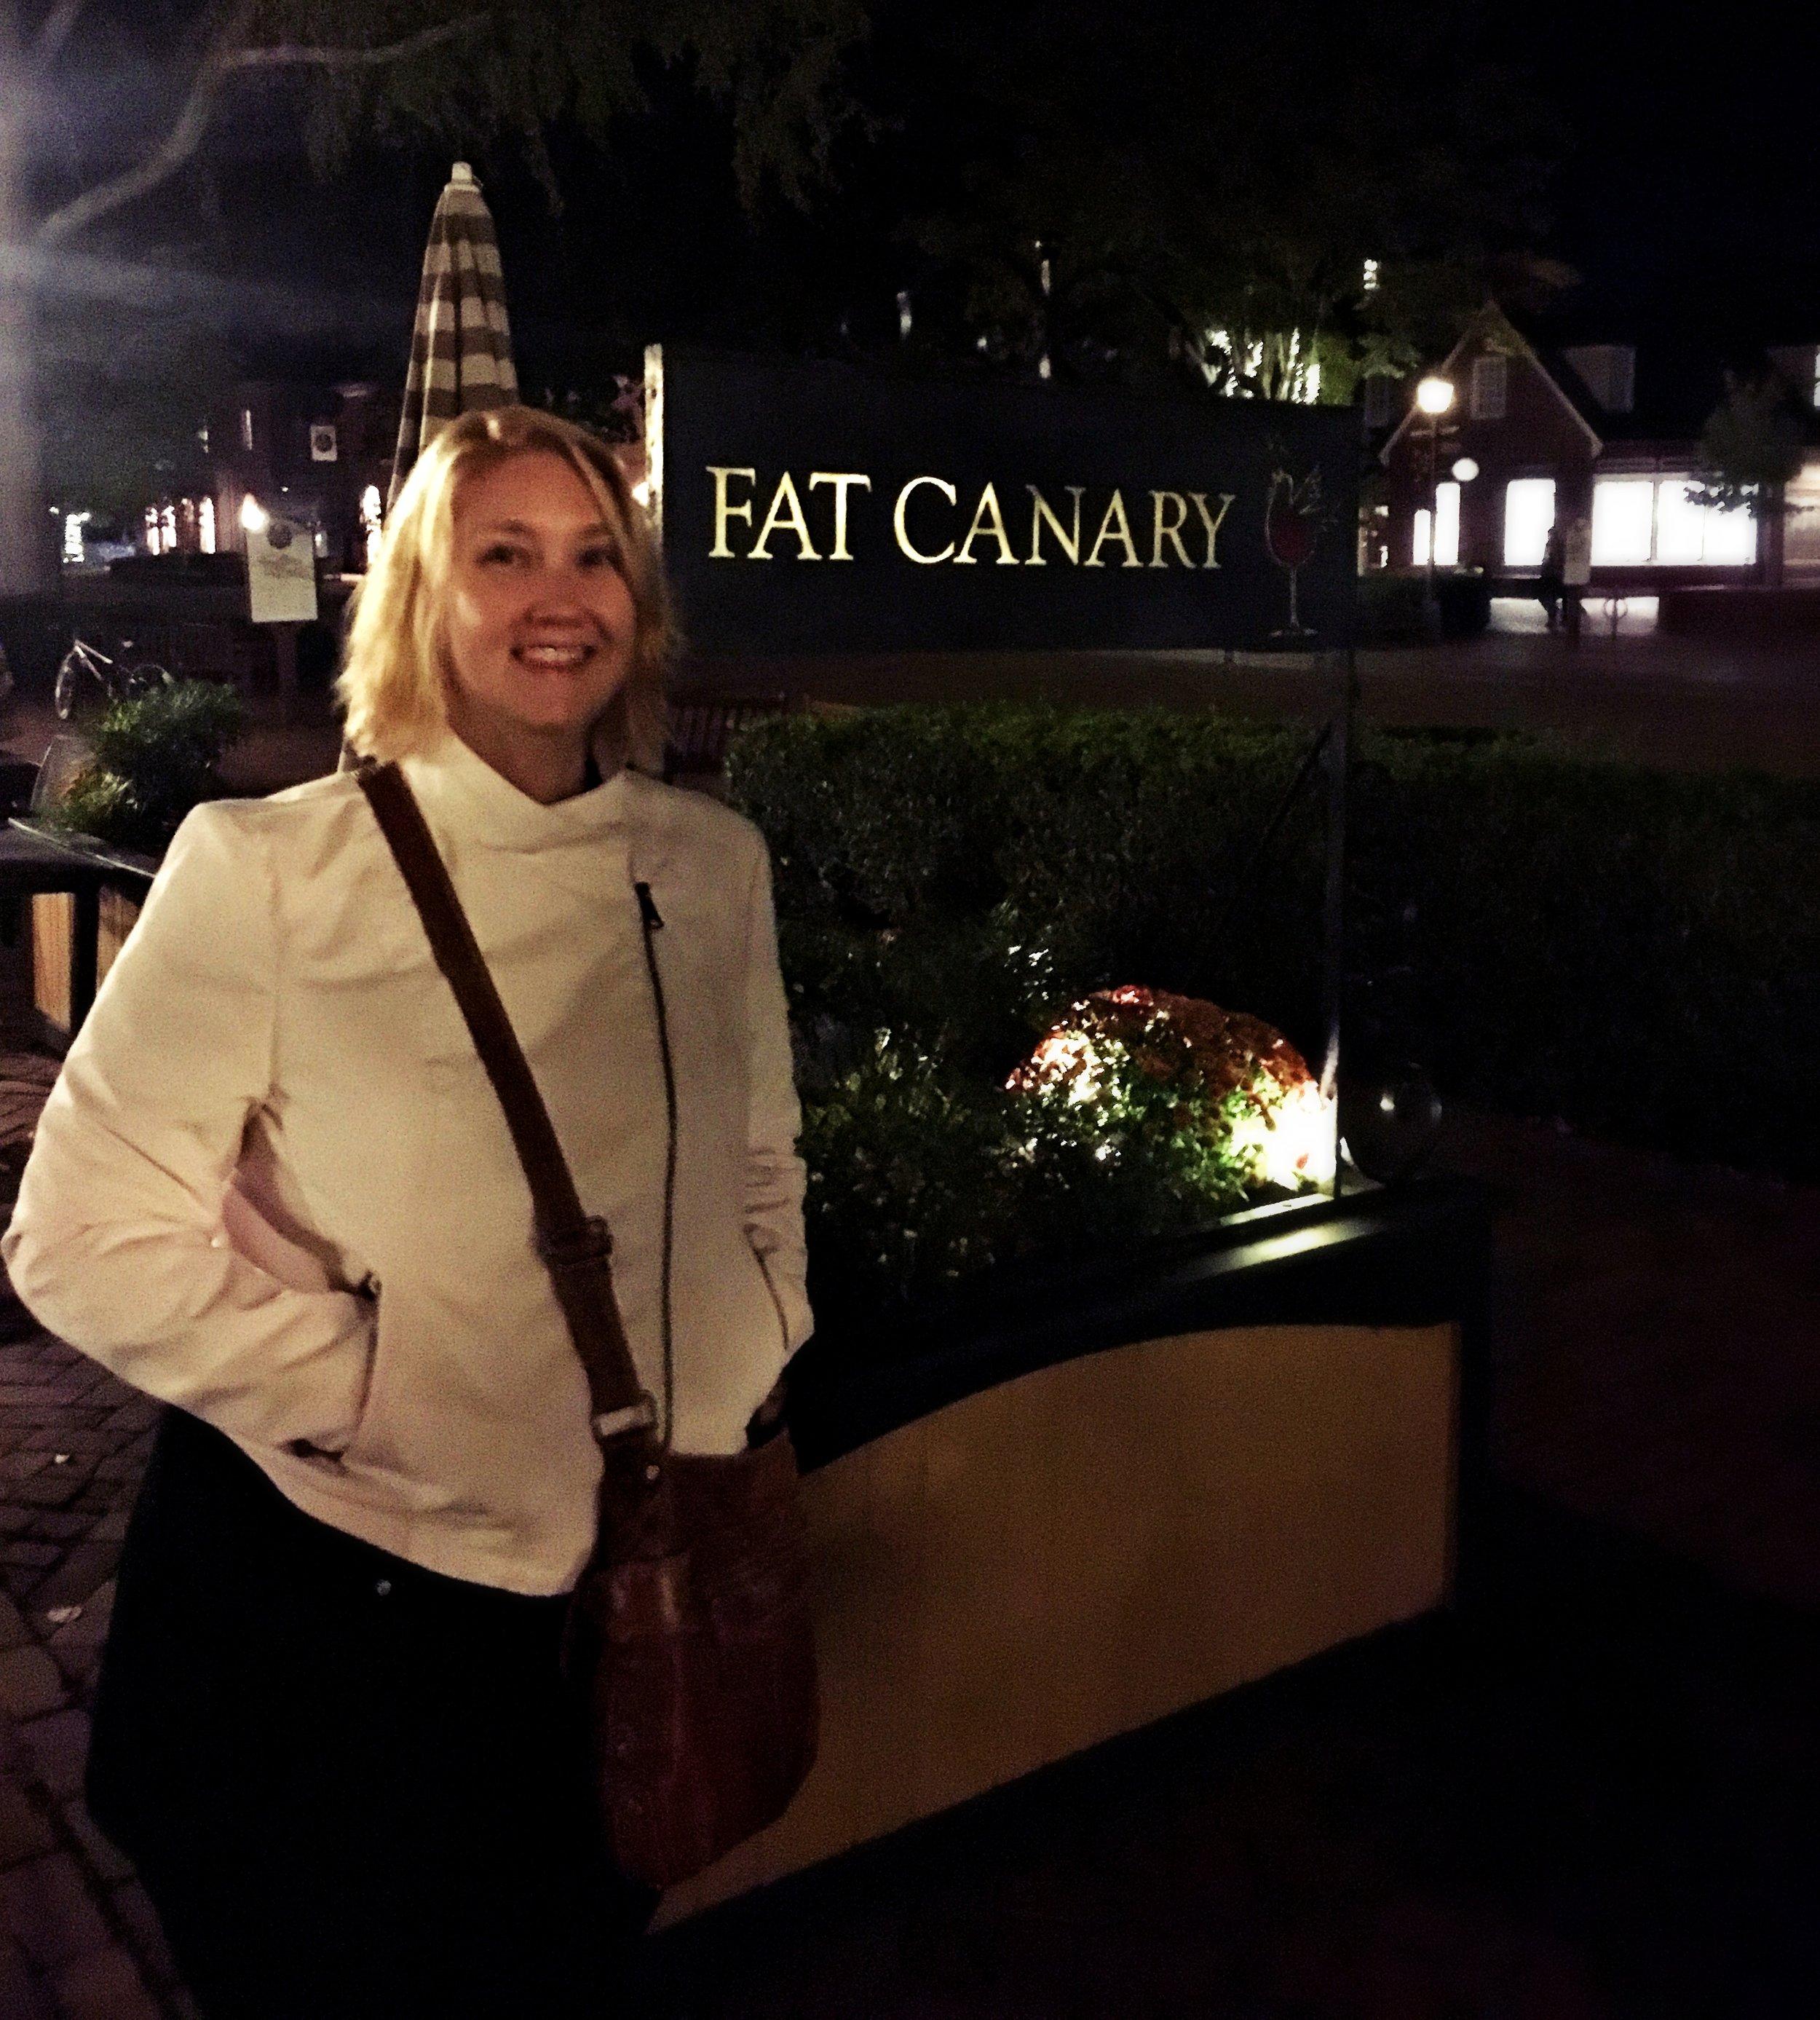 Fat Canary - Sign.JPG